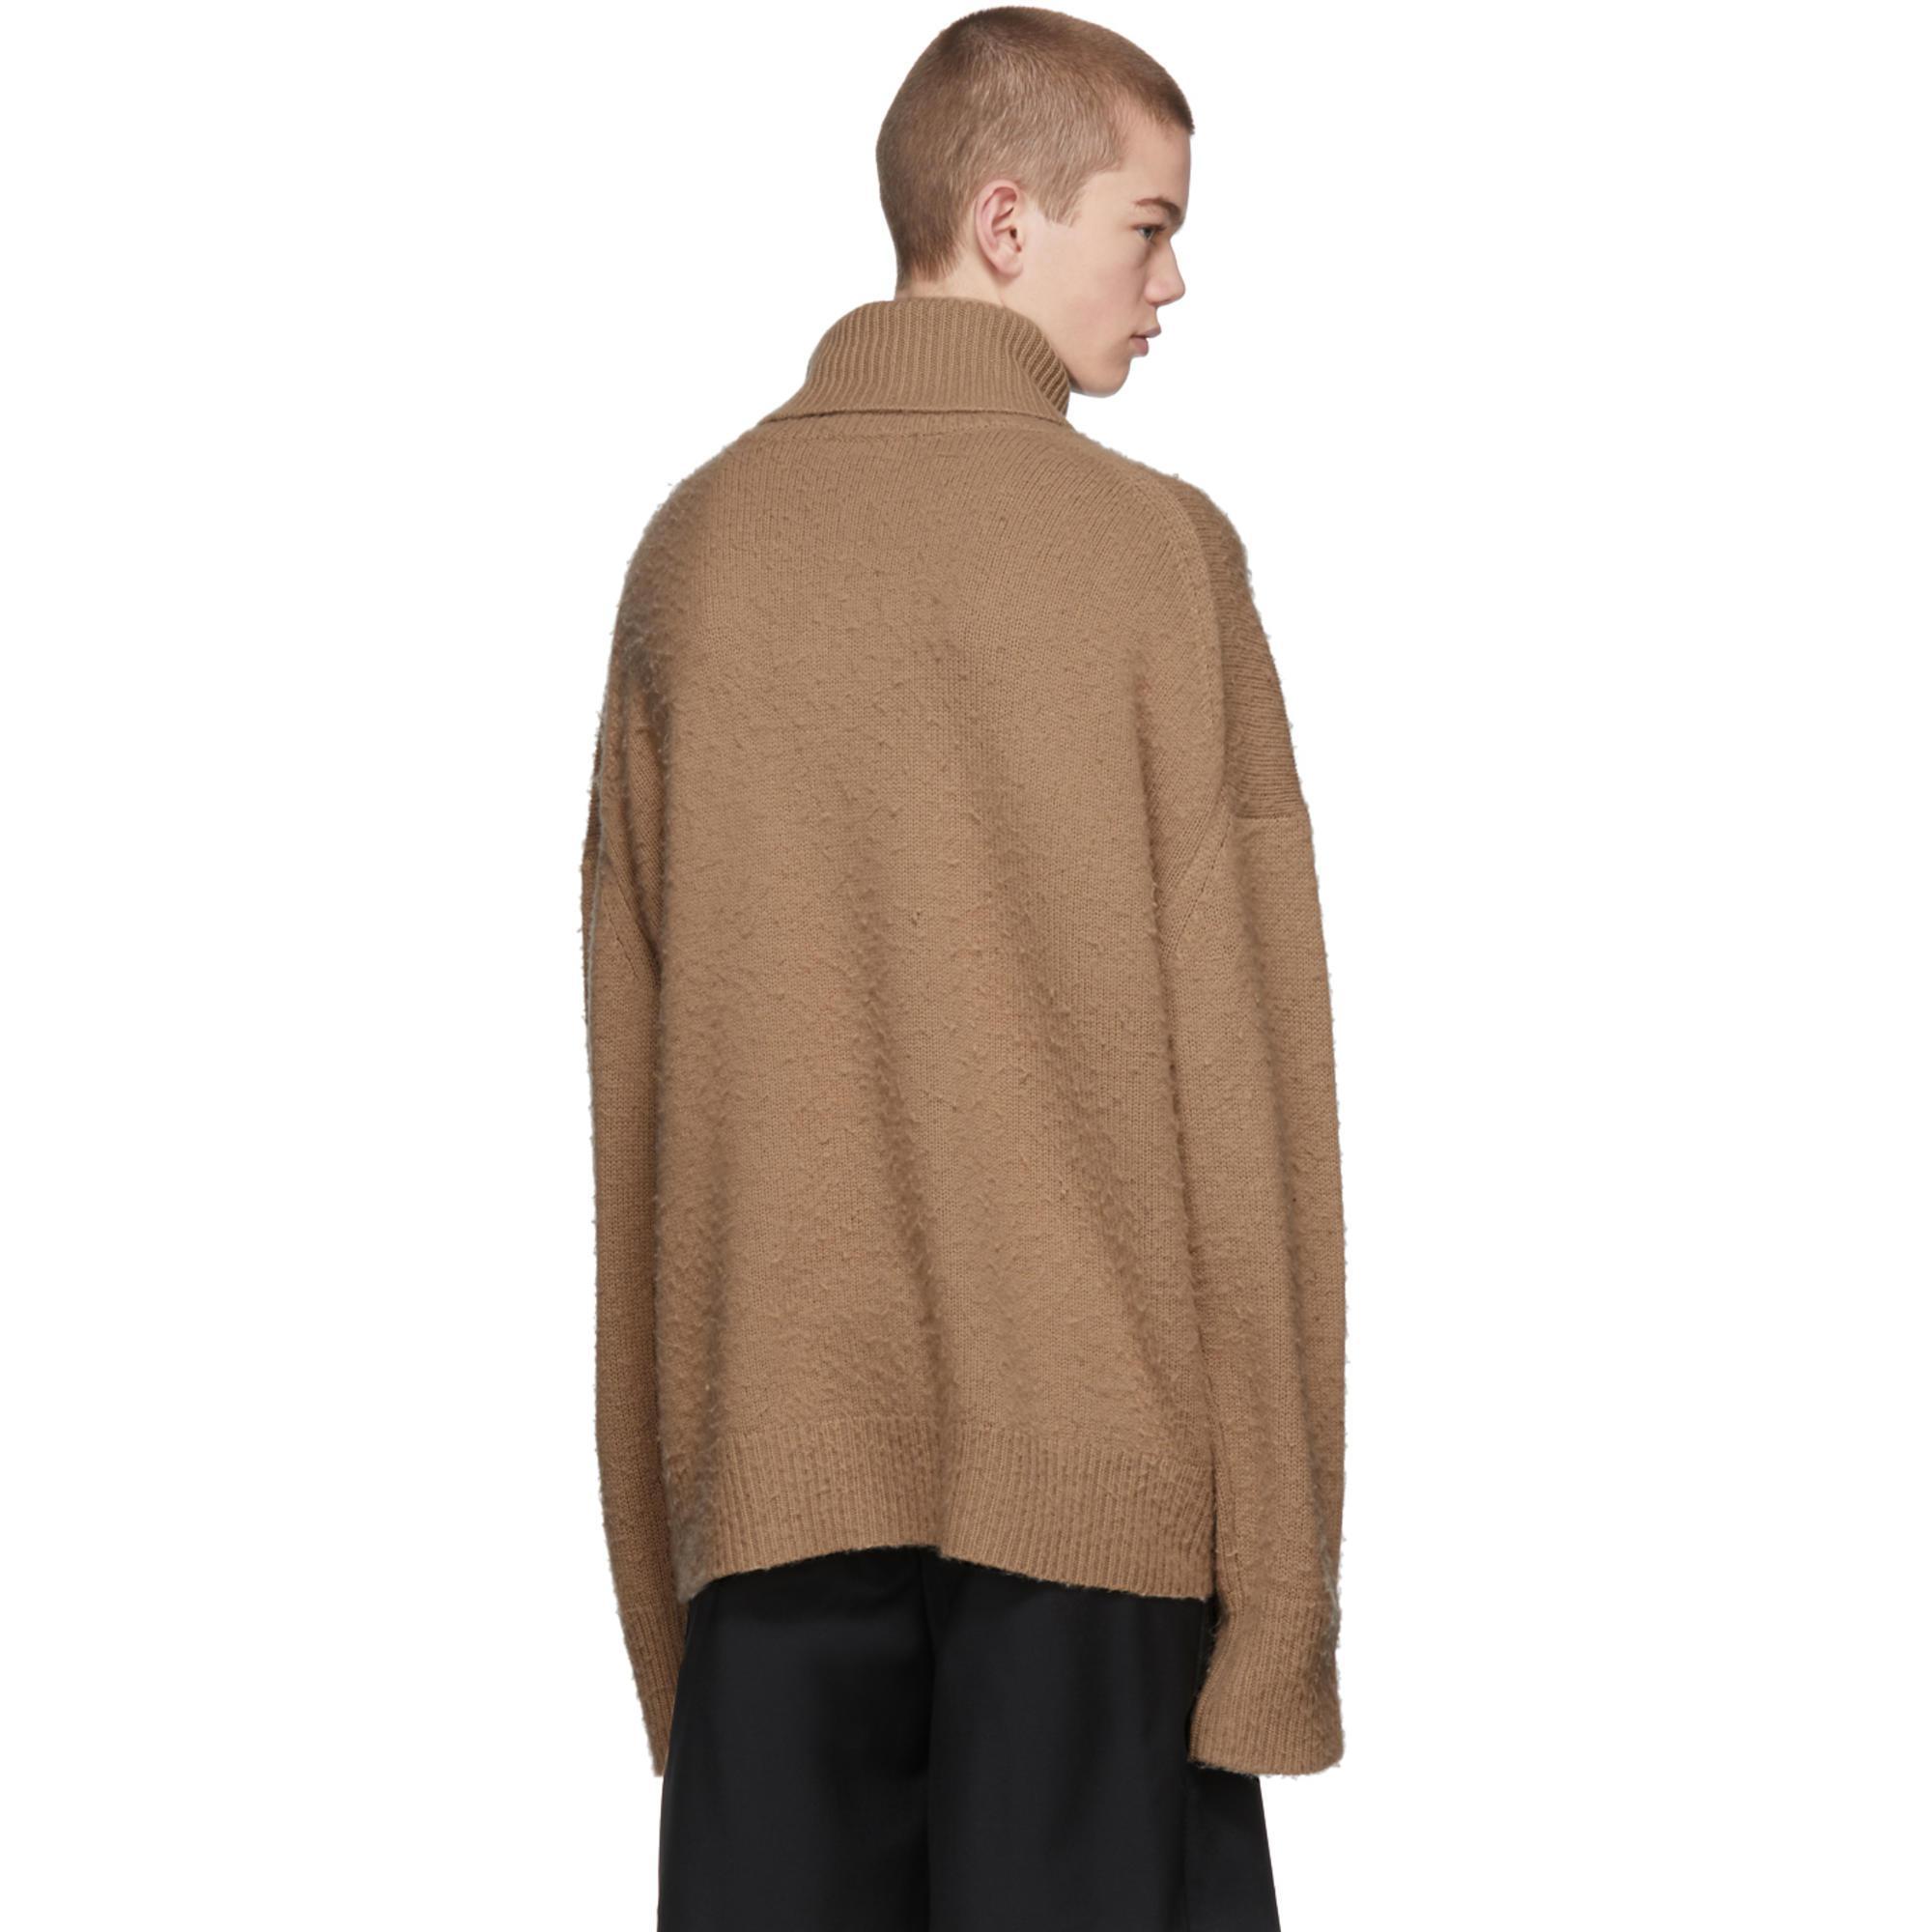 Acne Studios Wool Beige Nyran Turtleneck in Natural for Men